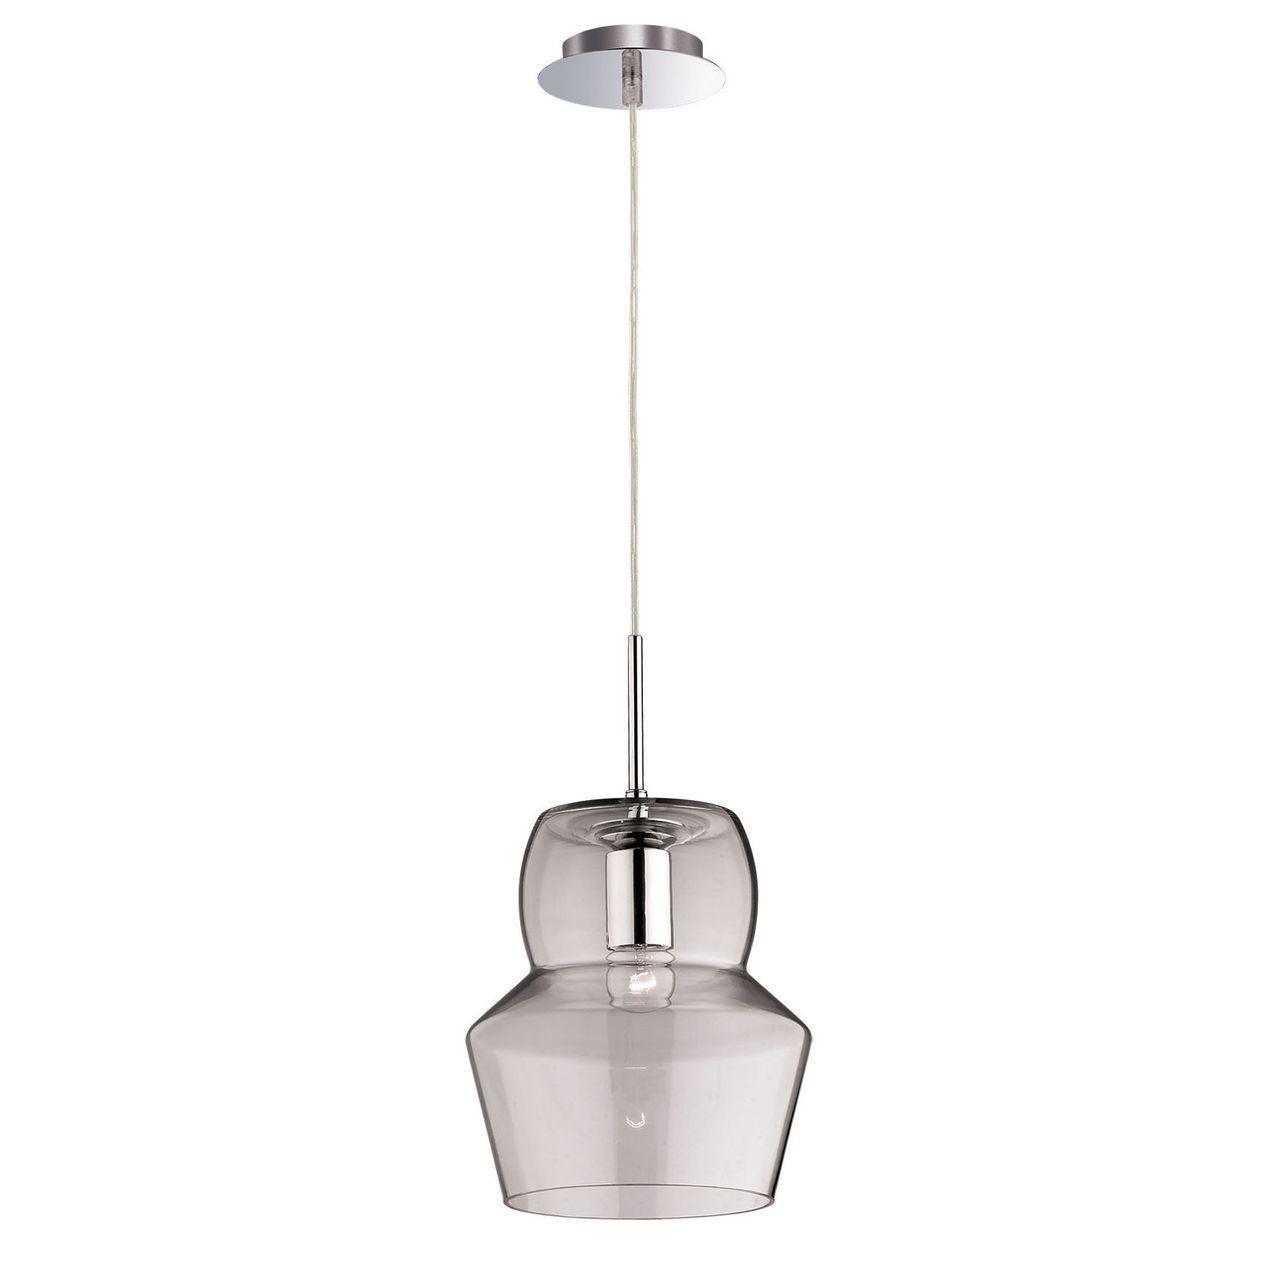 Подвесной светильник Ideal Lux Zeno SP1 Big Trasparente ideal lux подвесной светильник ideal lux zeno sp1 big fume page 4